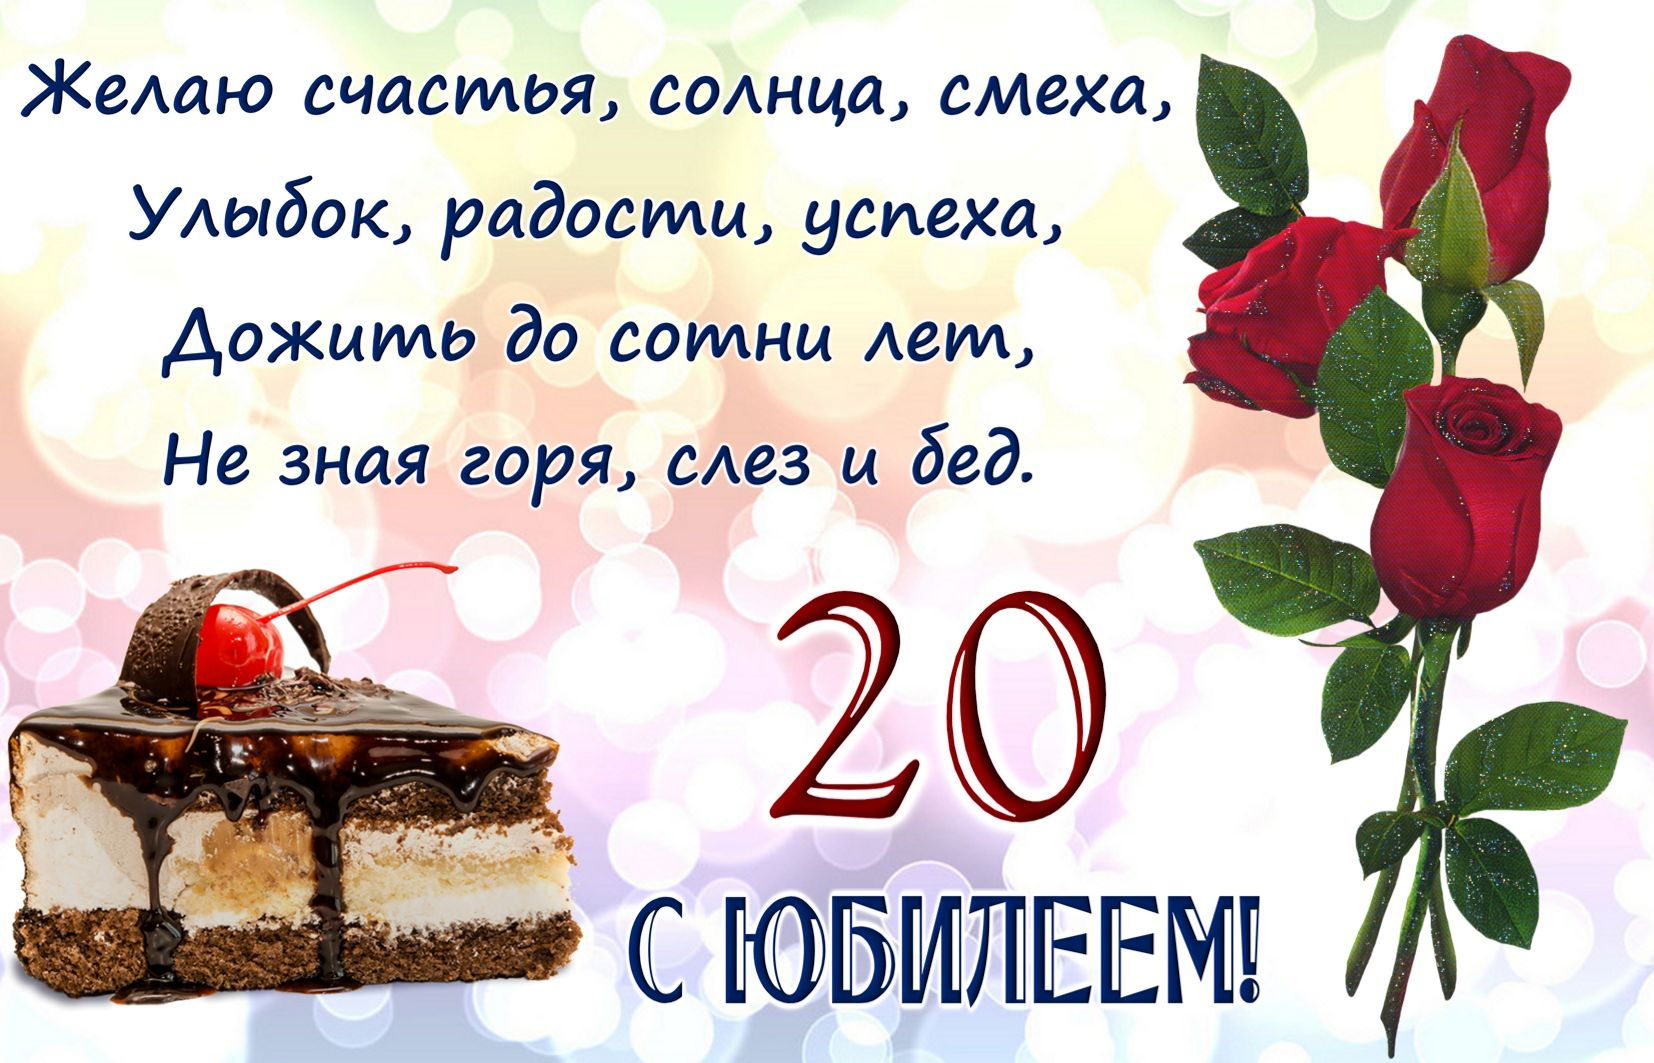 Открытка на юбилей на 20 лет - тортик с вишенкой и пожелание